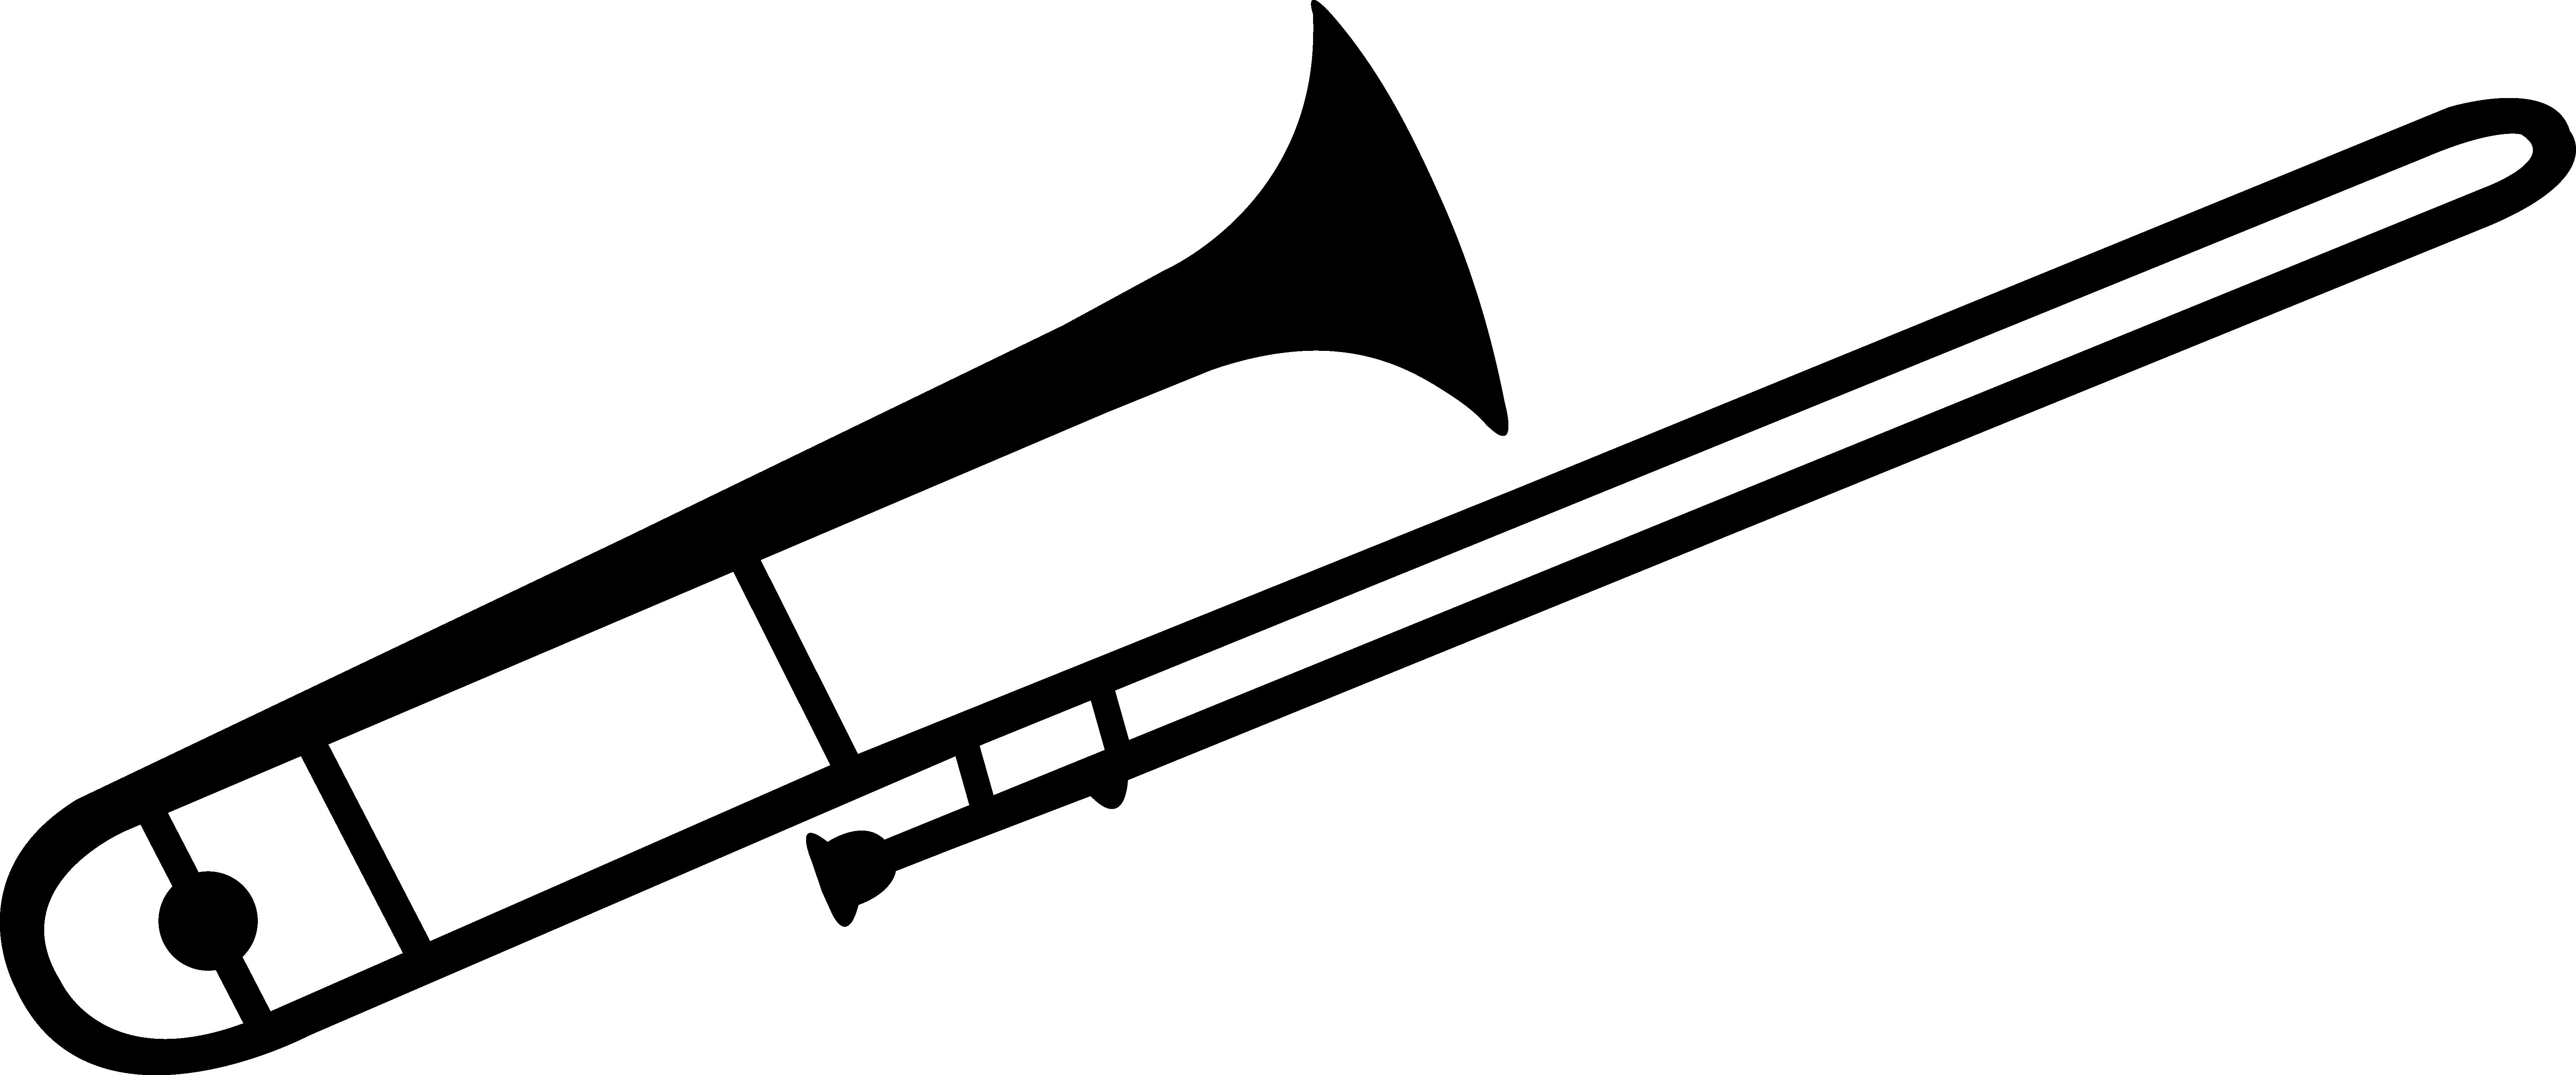 Trombone Silhouette Musical instrument Clip art.